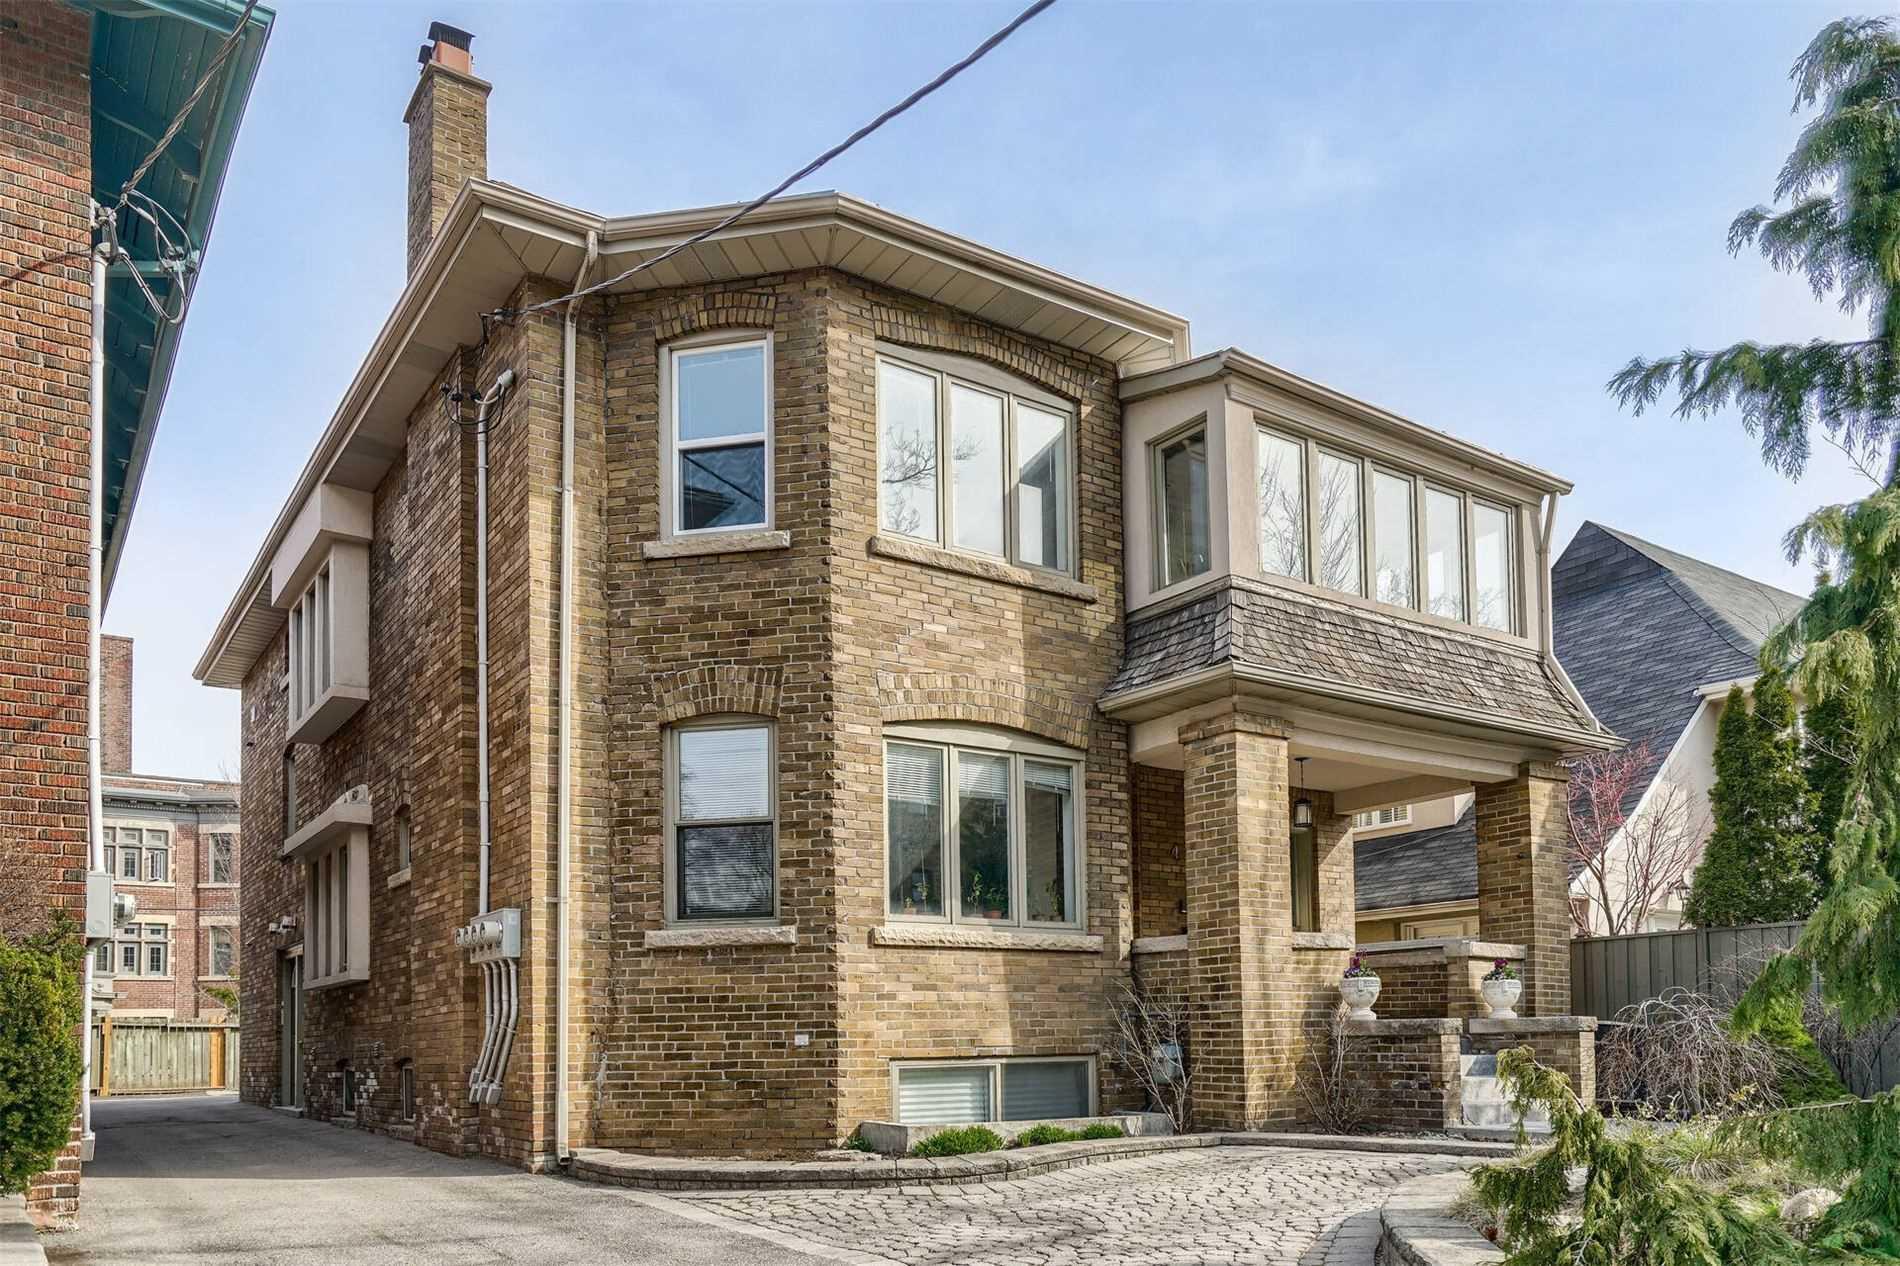 4 & 6 Oriole Gdns, Toronto, Ontario M4V1V7, 9 Bedrooms Bedrooms, 26 Rooms Rooms,13 BathroomsBathrooms,Detached,For Sale,Oriole,C5377495